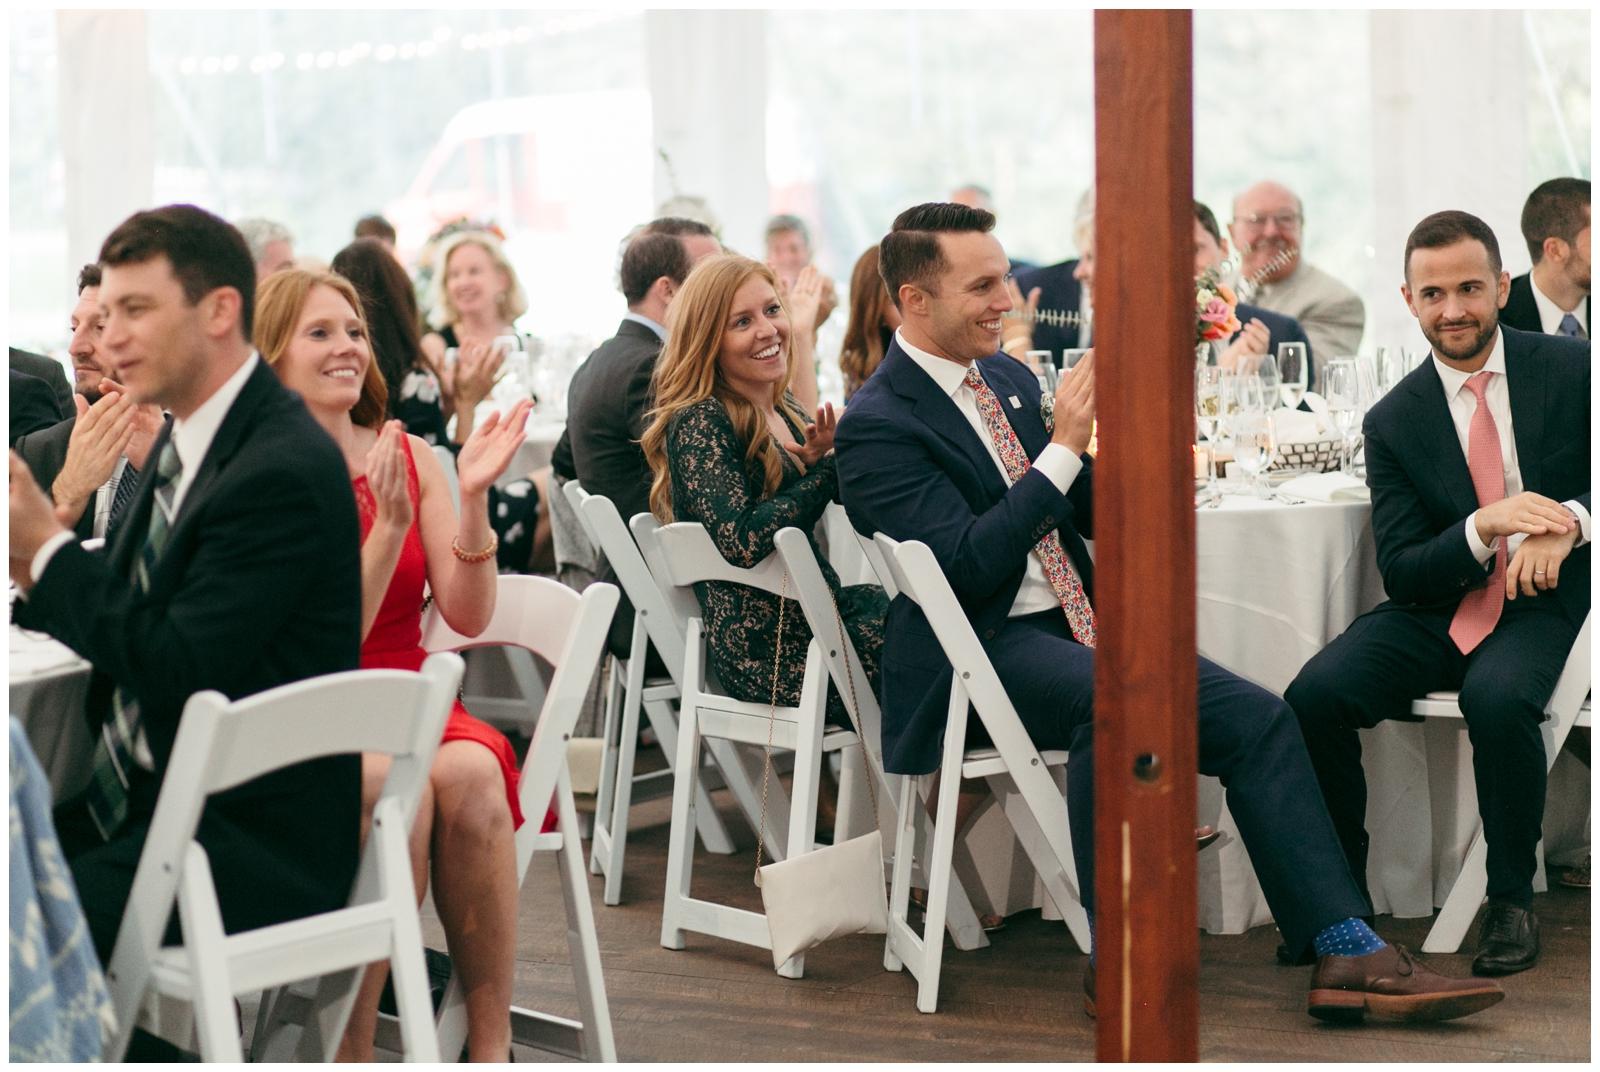 Moraine-Farm-wedding-Bailey-Q-Photo-Massachusetts-wedding-photpgrapher-126.jpg